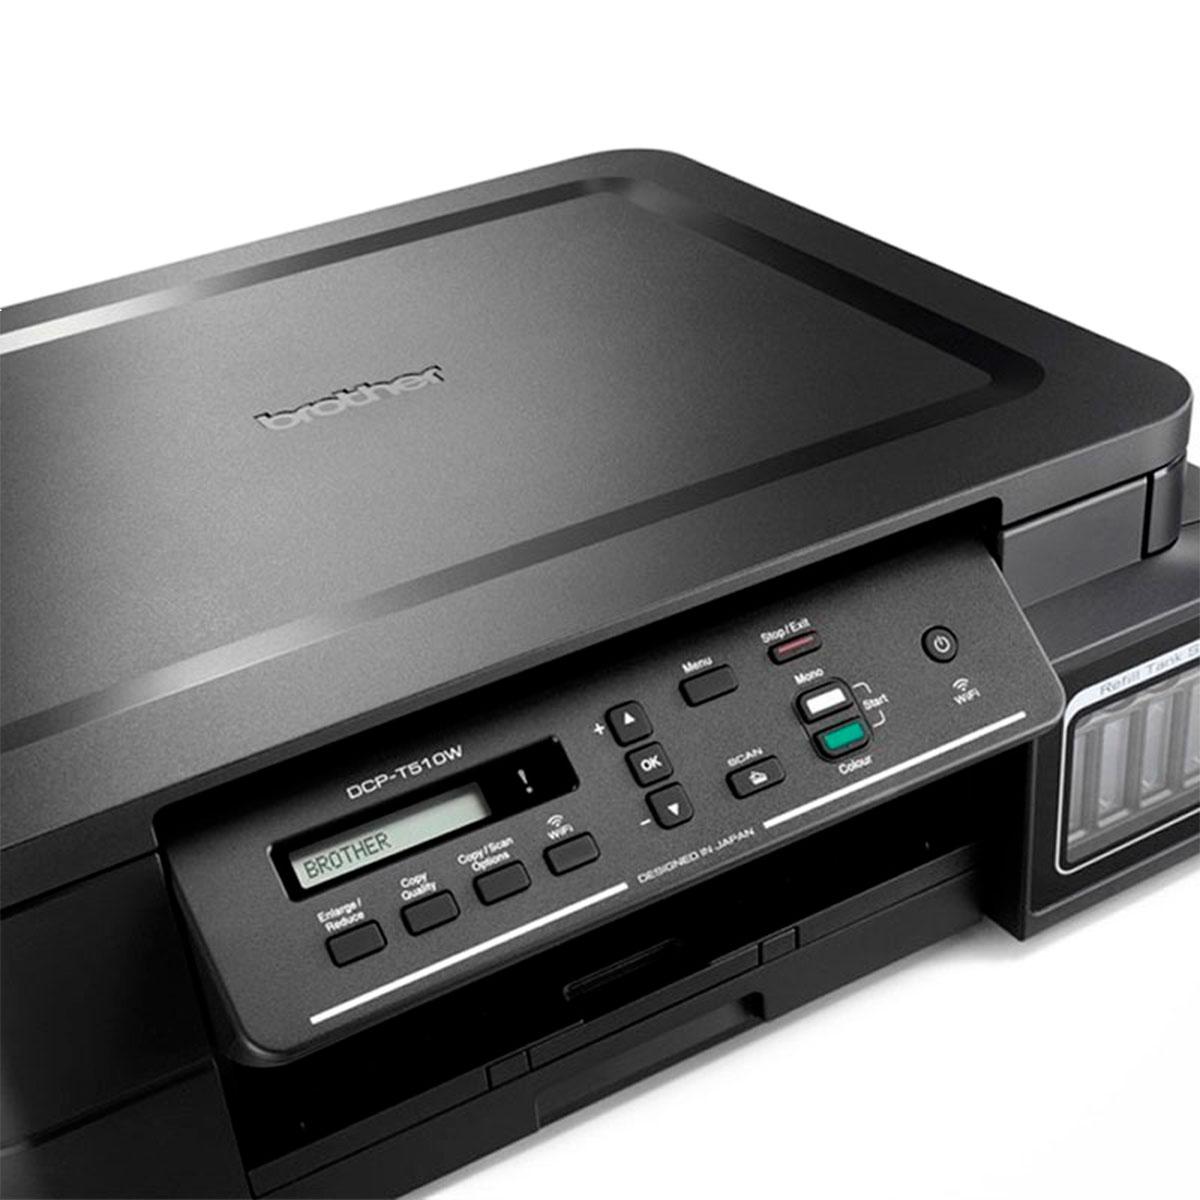 Impressora Multifuncional Brother DCP-T510W, Tanque de Tinta (Ink Tank), Colorida, Wi-Fi, USB 2.0